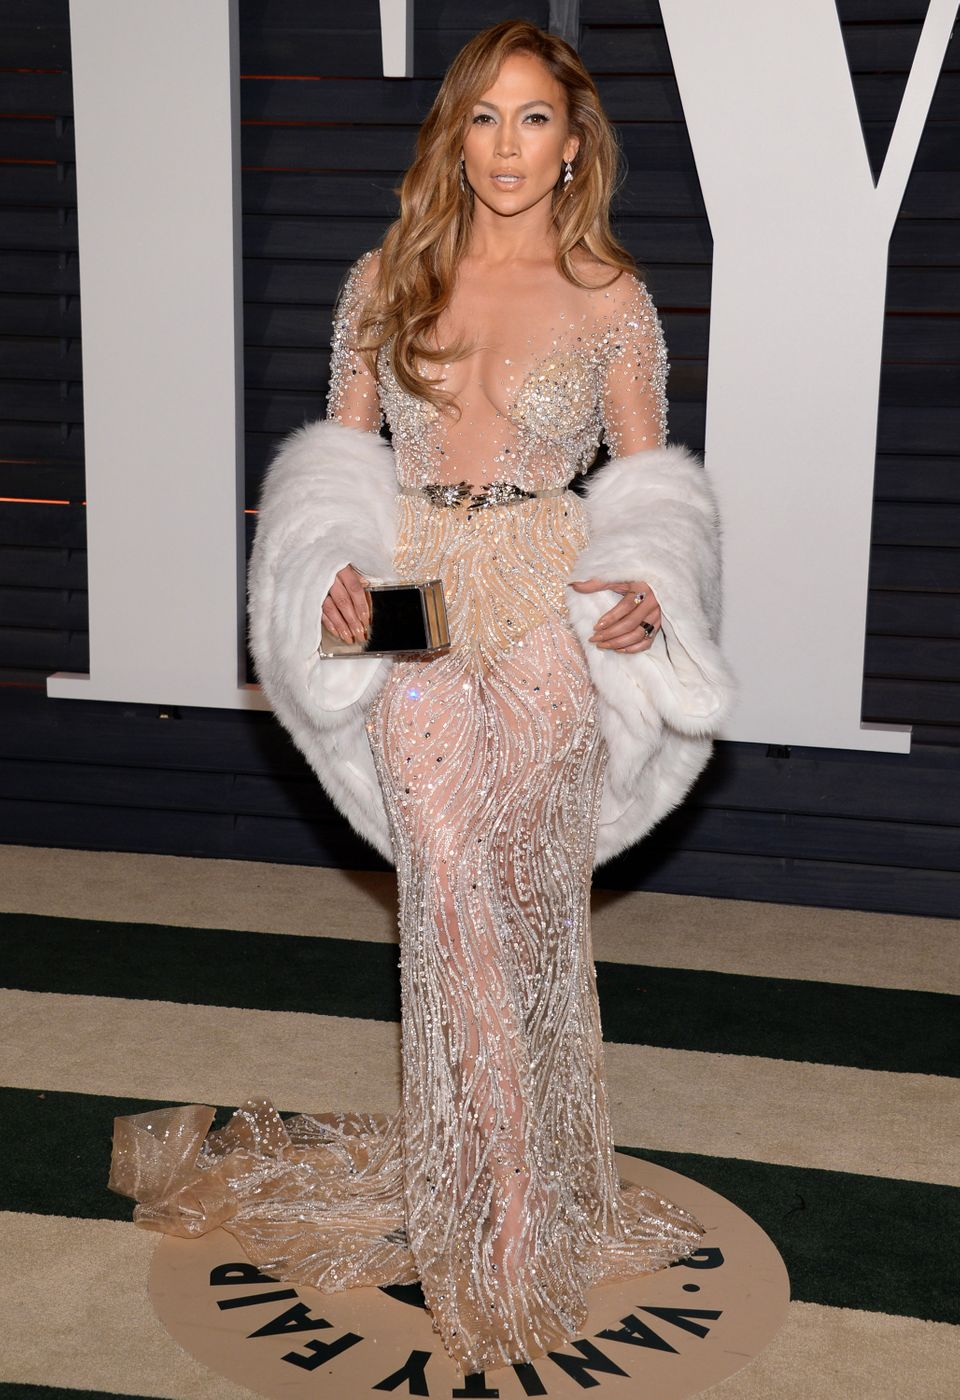 Irina Shayk And Rita Ora Lead The Sheer Dress Pack At The Vanity ...